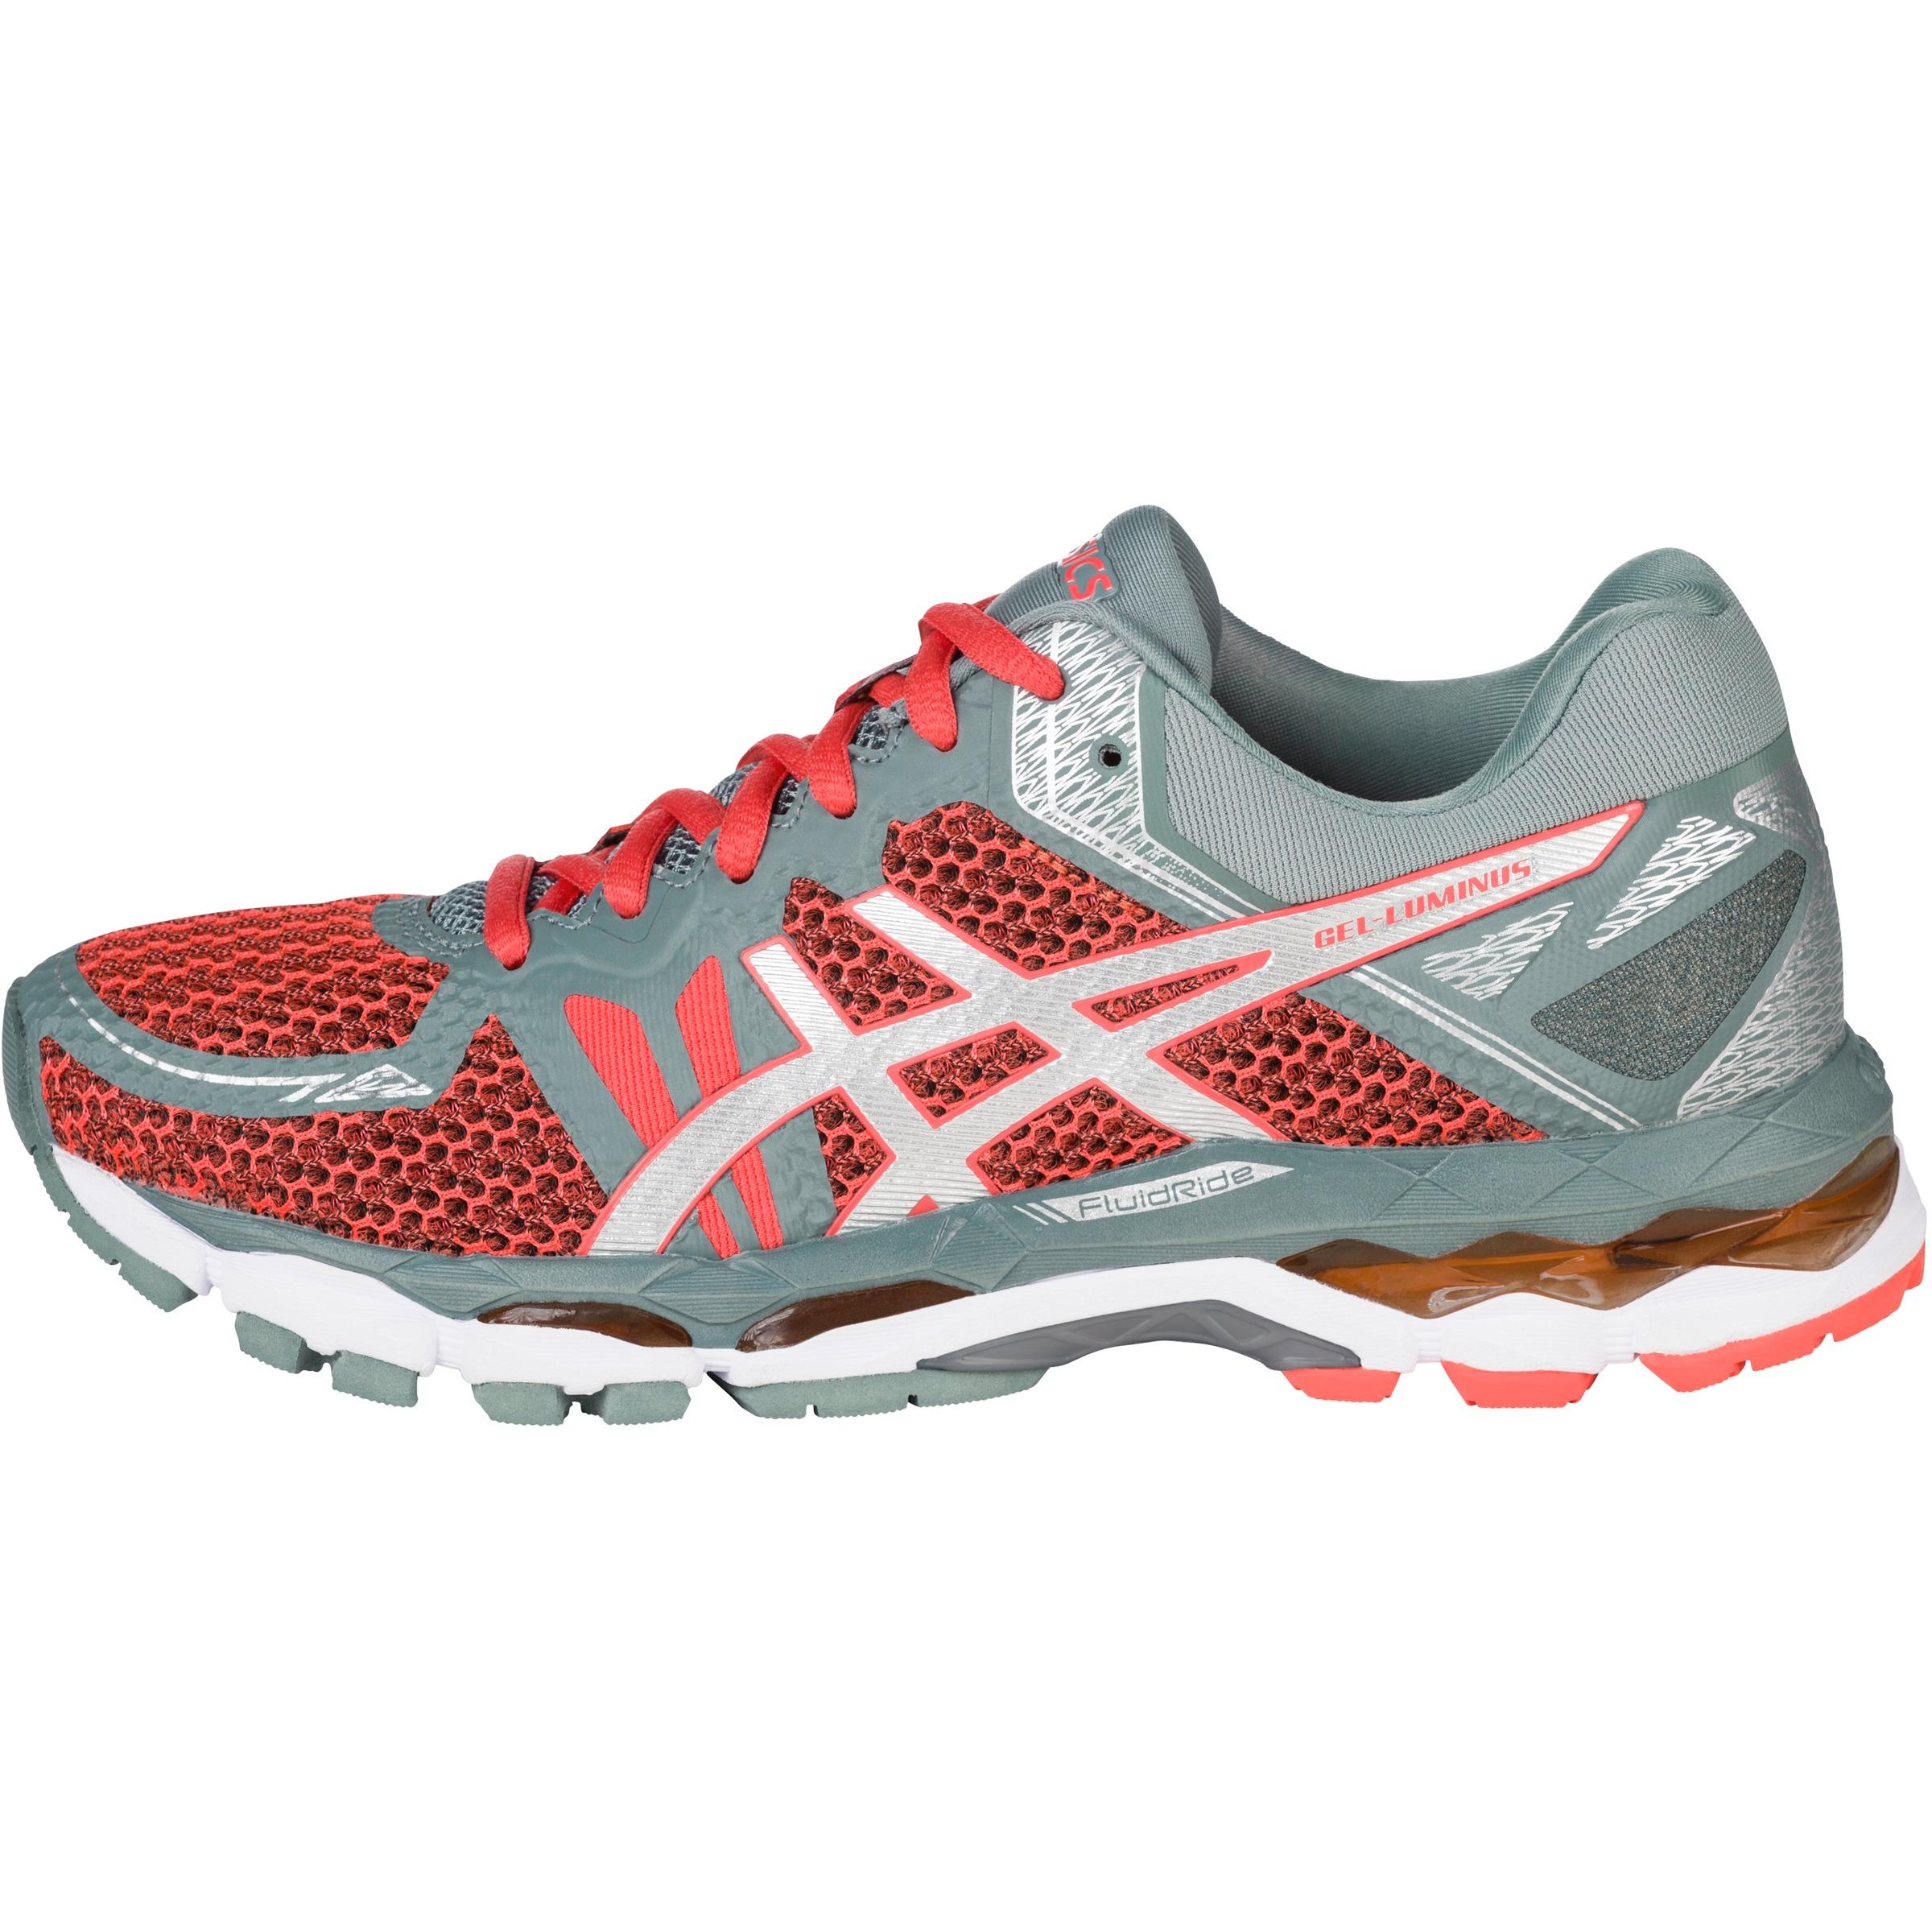 ASICS Herren Sport Fitness Running Lauf Schuhe Laufschuhe